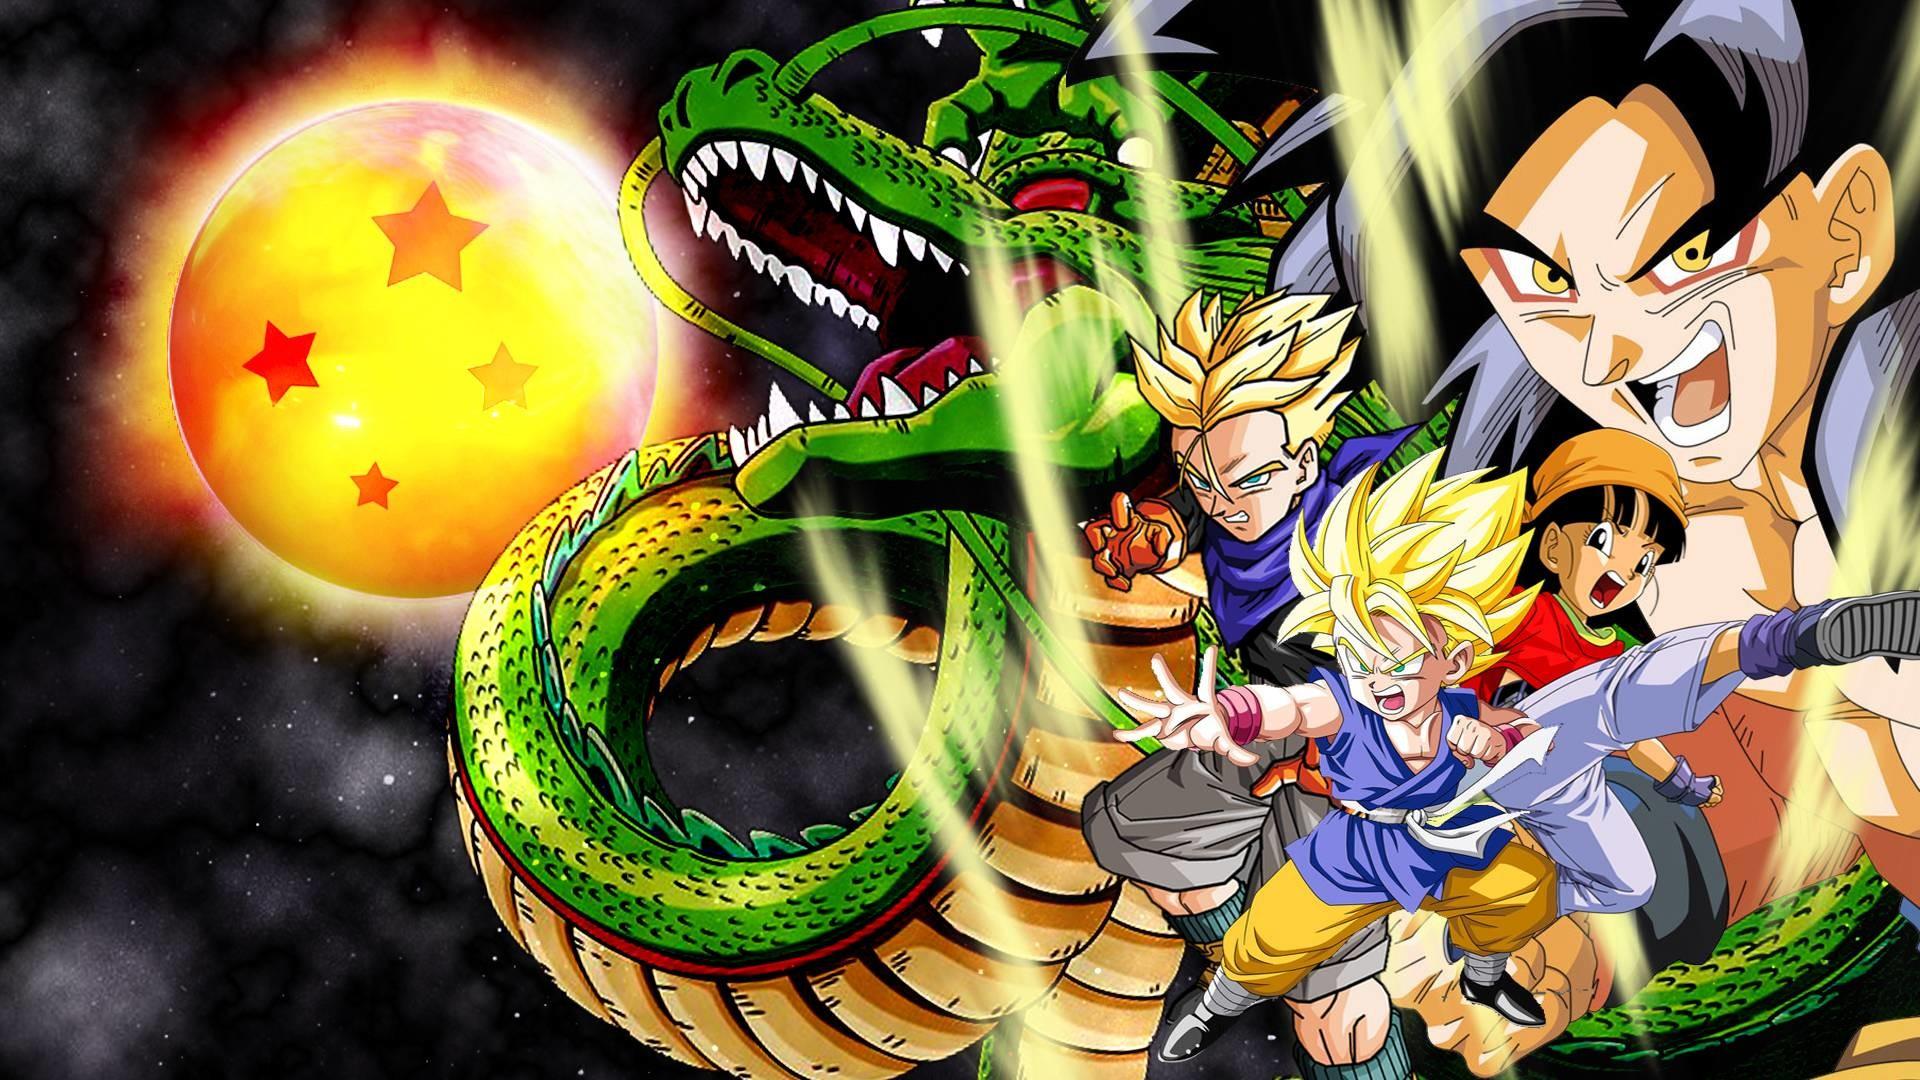 Dragon Ball Gt Wallpapers Wallpapertag